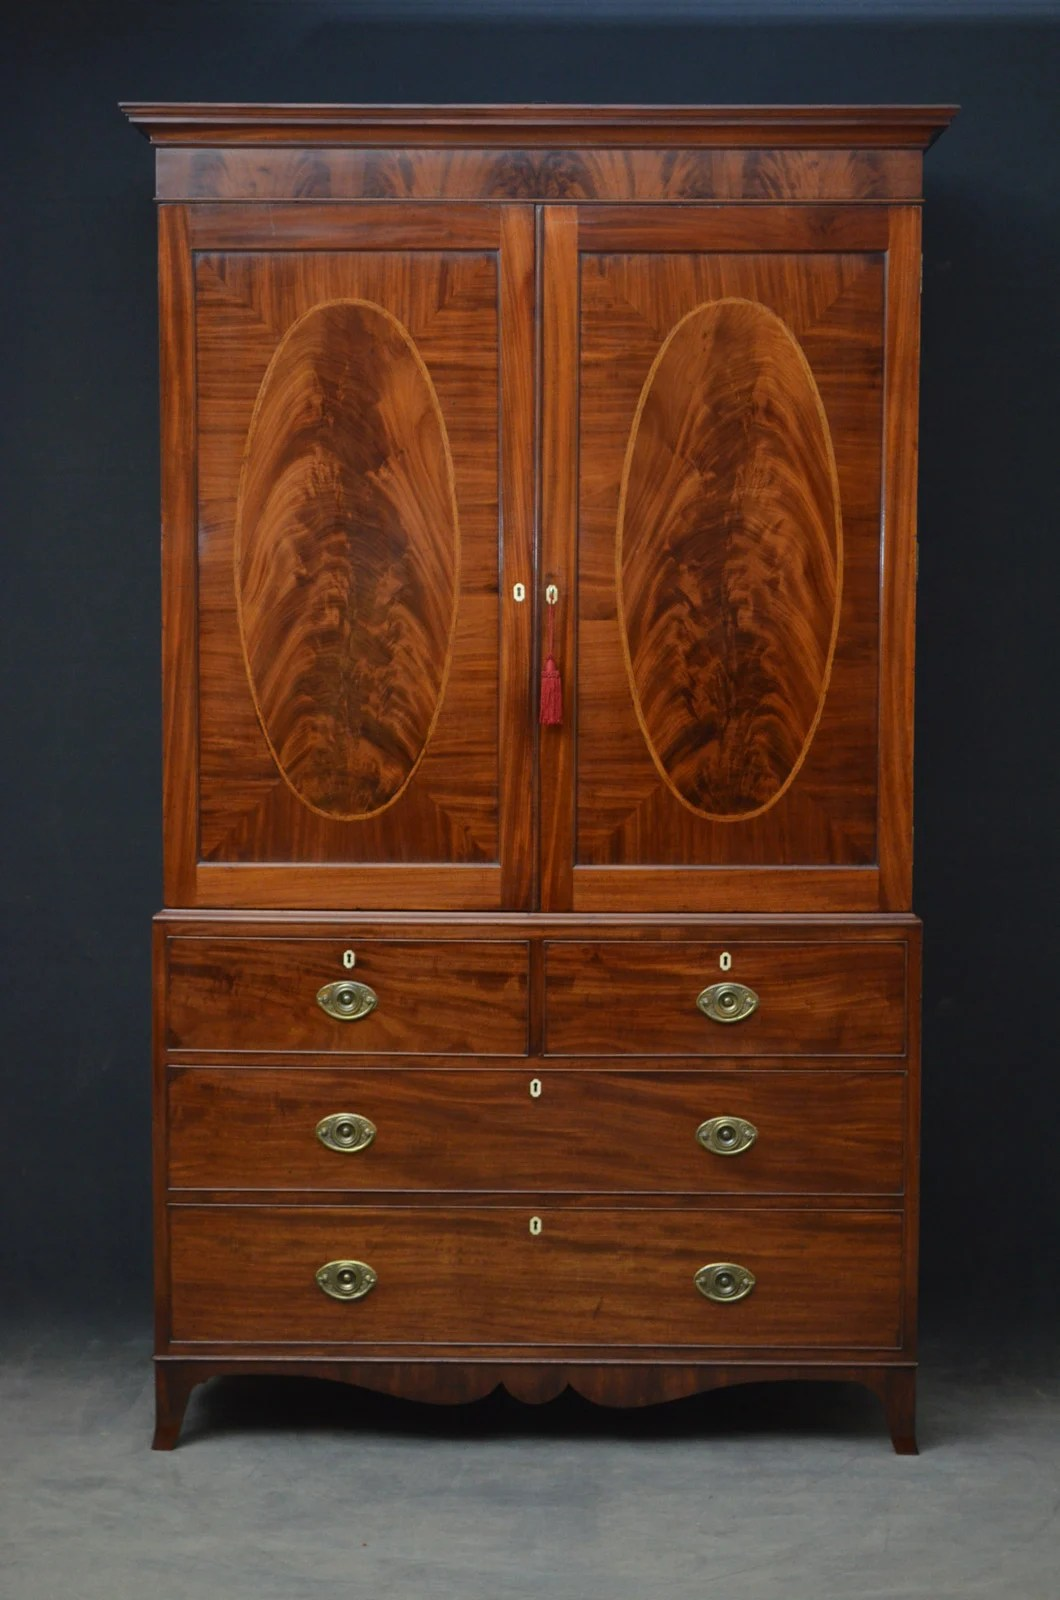 Ambitious Antique Victorian Wardrobe Armoires & Wardrobes